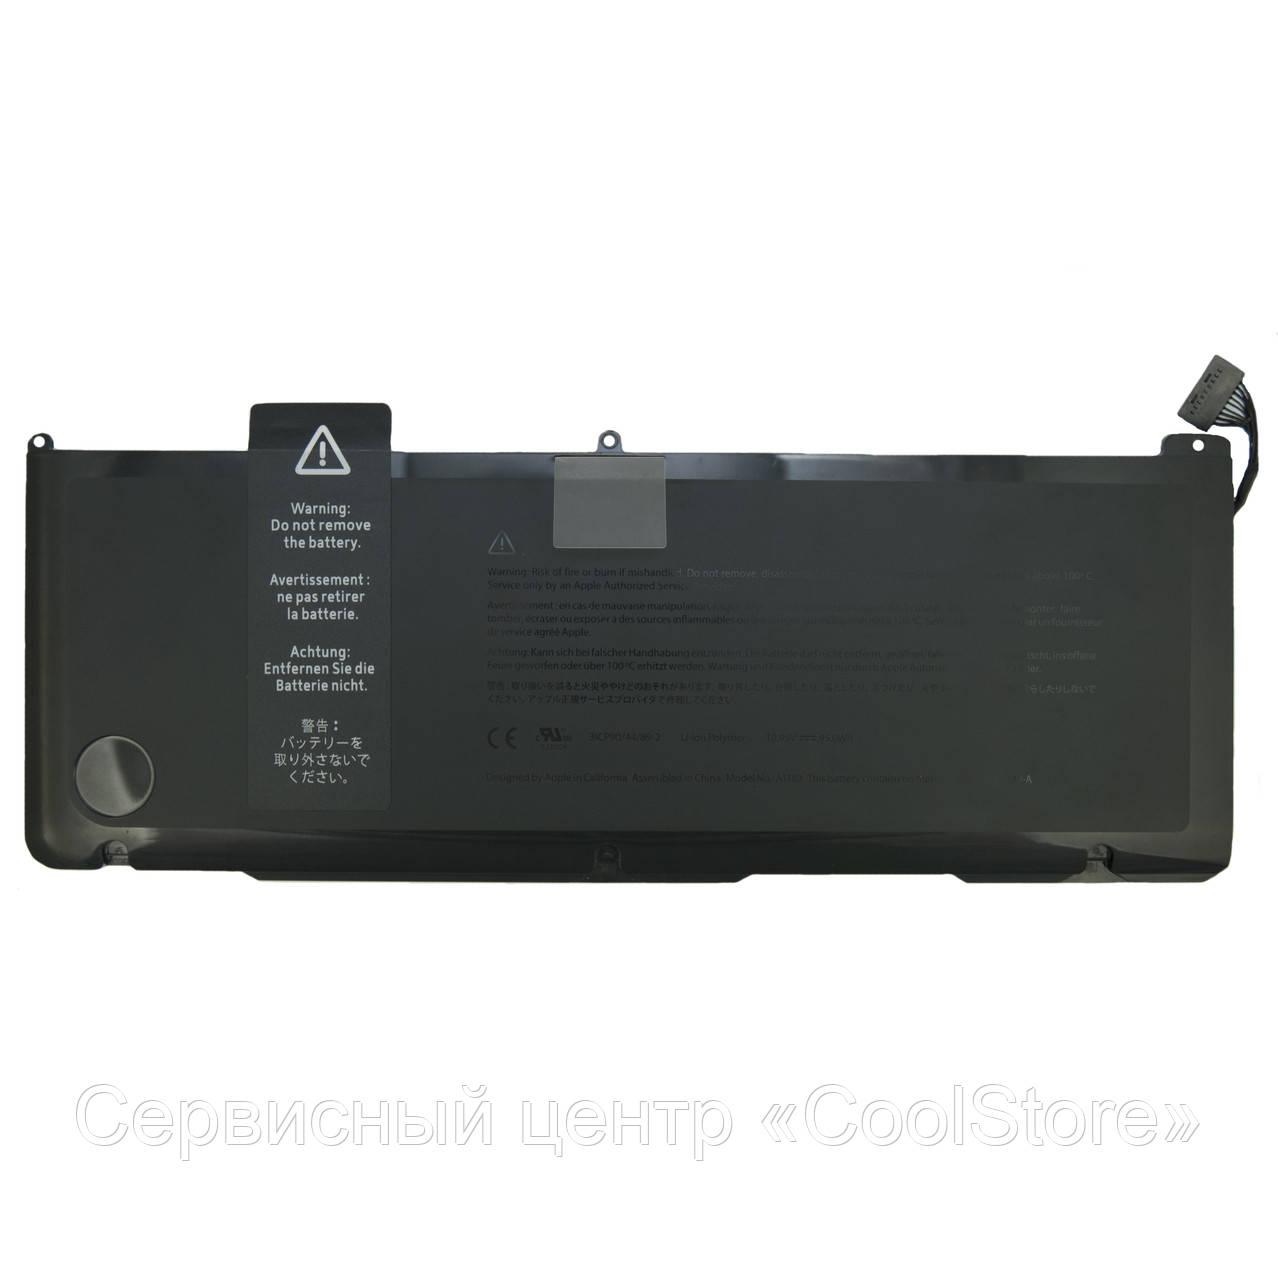 "Батарея A1383 для MacBook Pro 17"" 2011-2012гг. A1297"